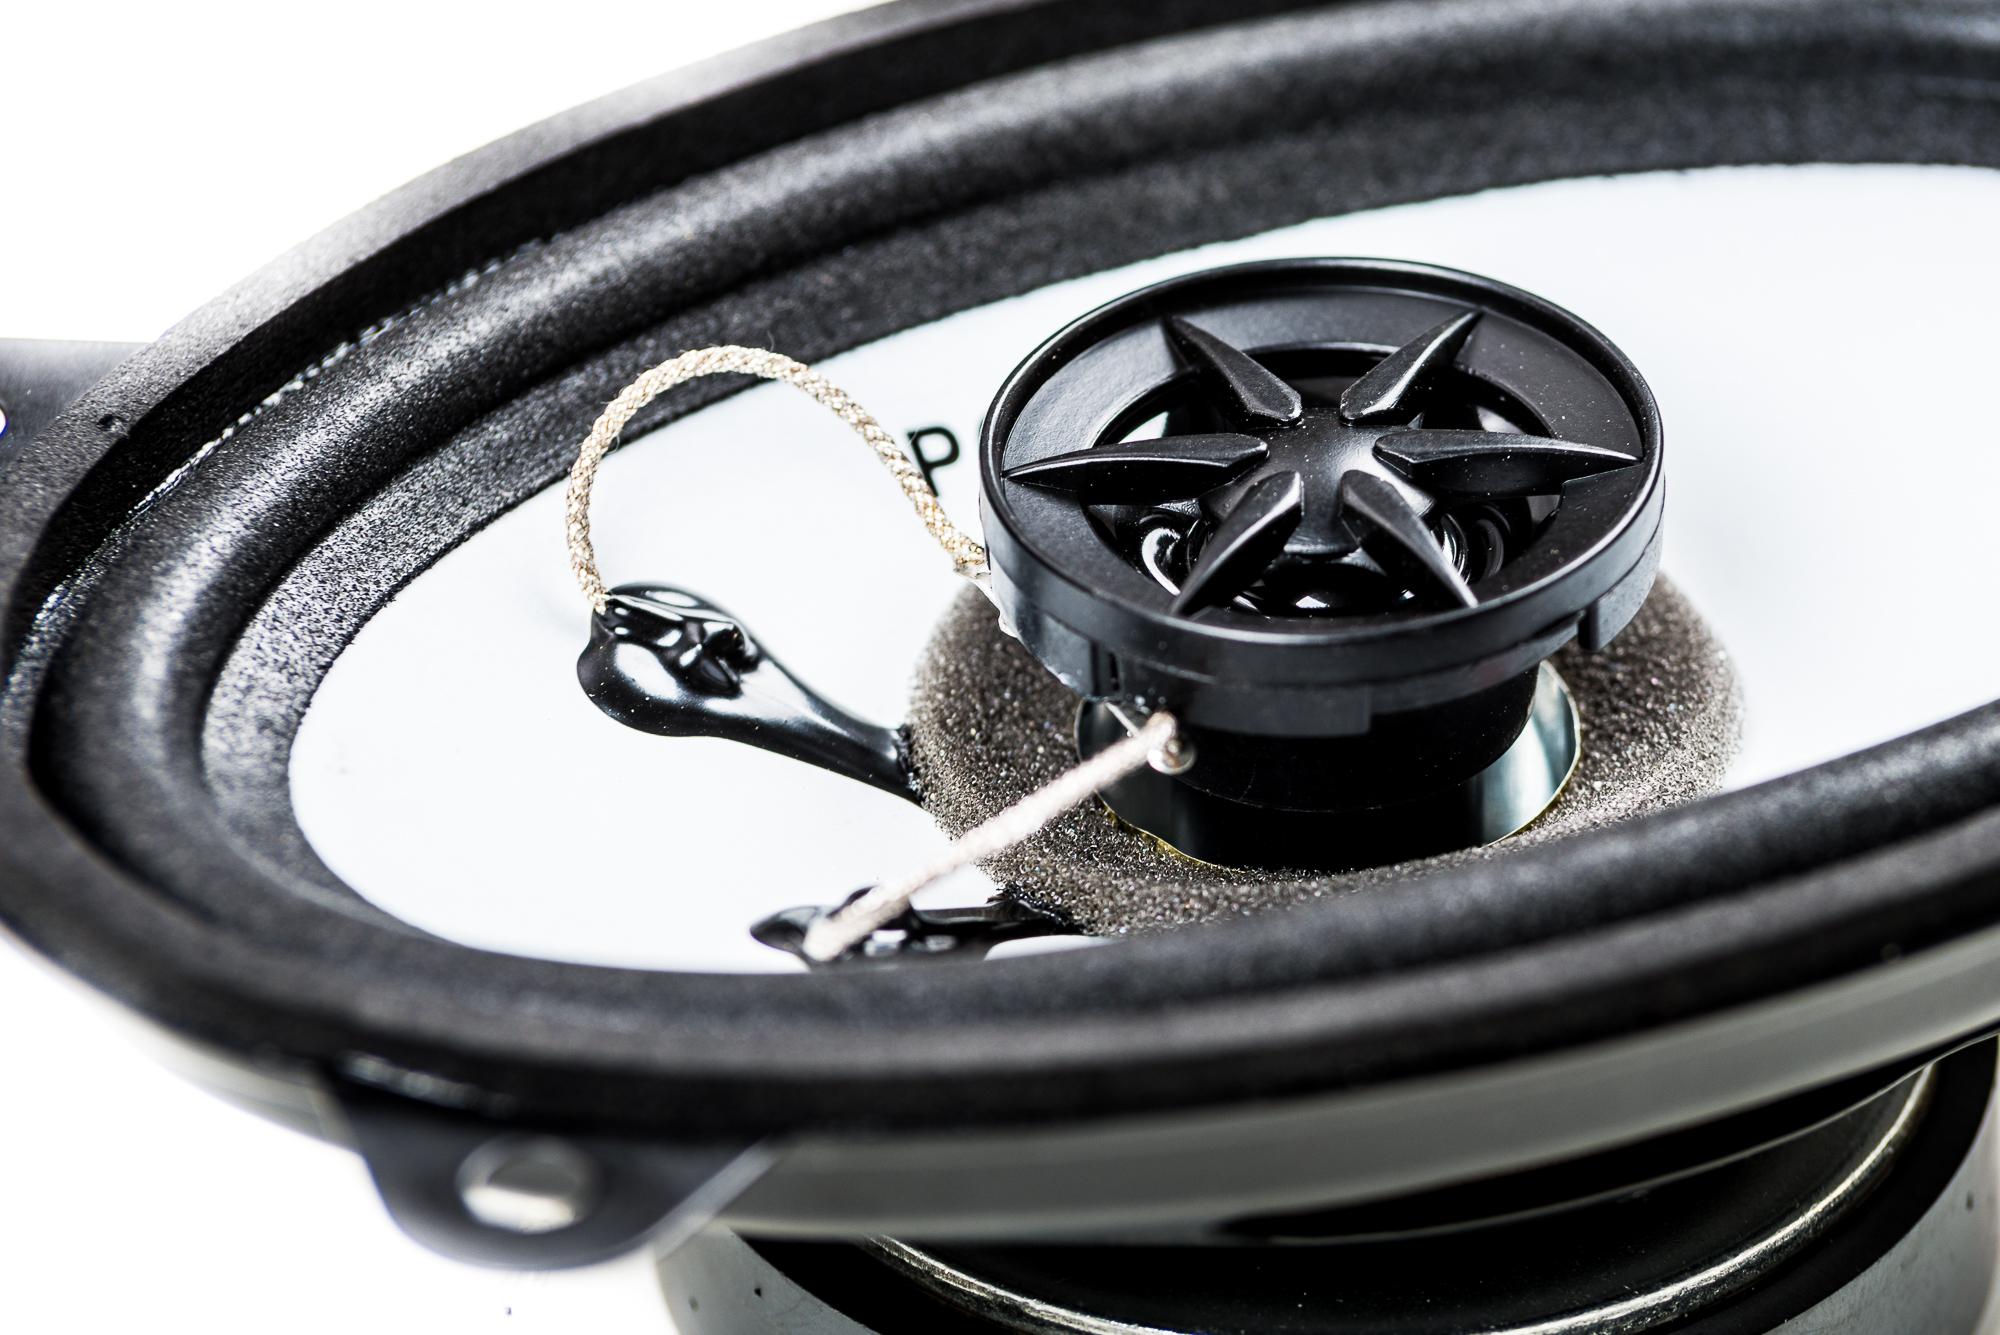 Lautsprecher 4x6 Zoll BMW 3er,5er,7er, Chevrolet Aveo,Kalos und K-Serie – Bild 3